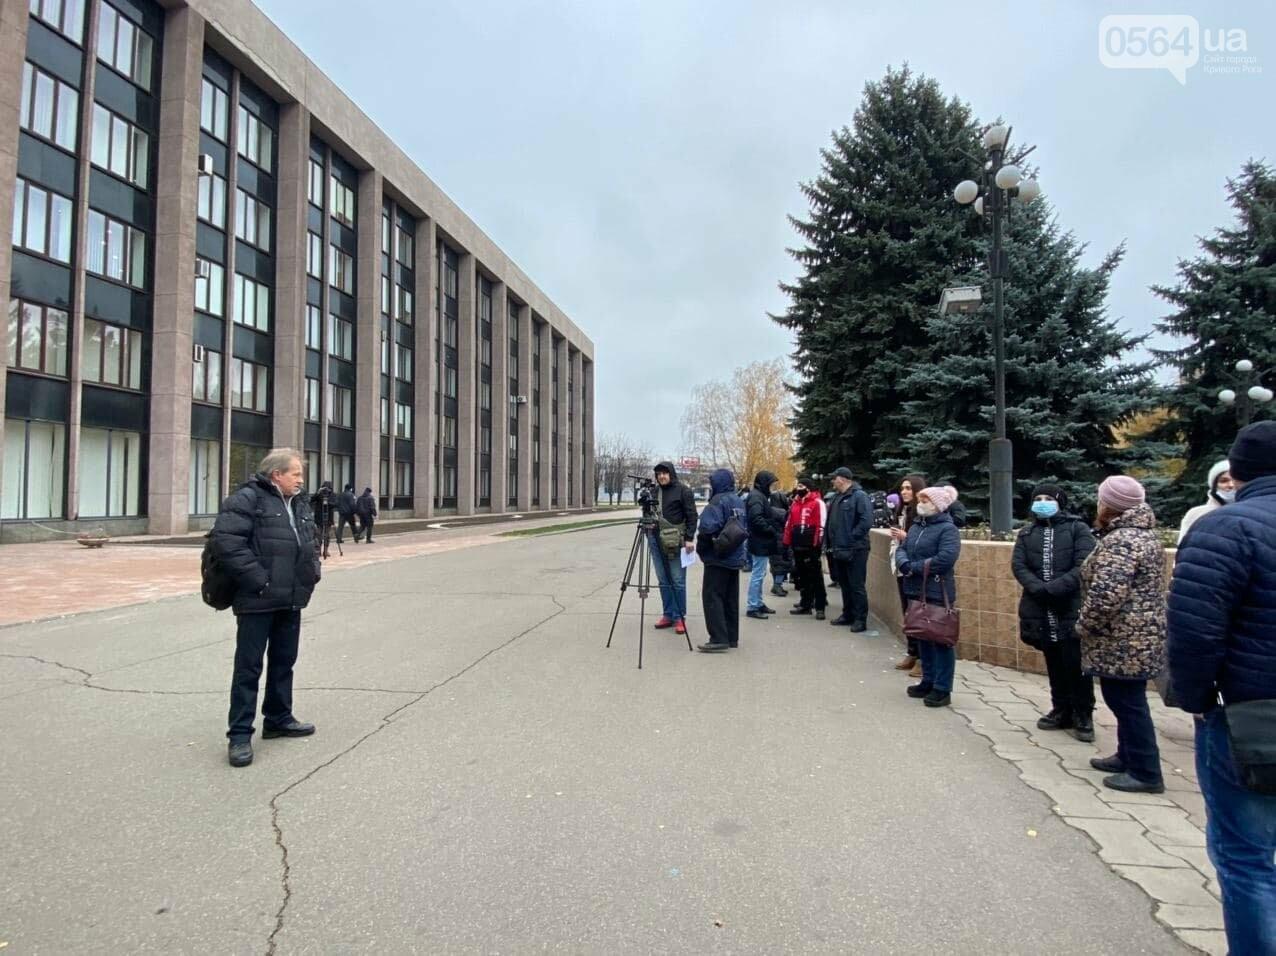 Представители малого бизнеса продолжили протест возле мэрии Кривого Рога, - ФОТО, ВИДЕО, фото-11